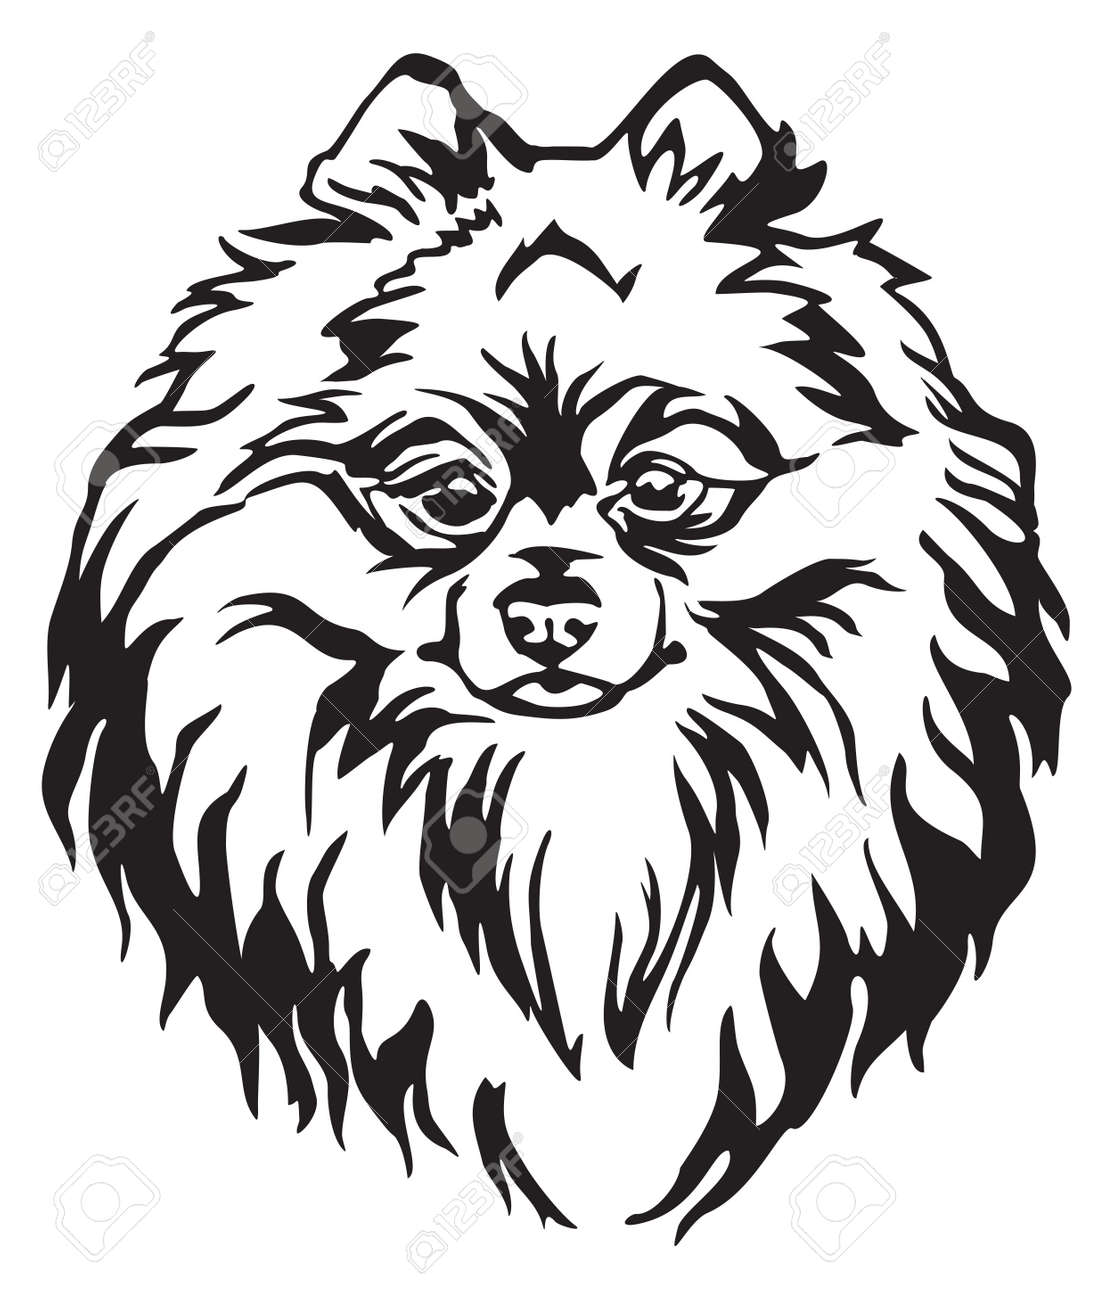 Decorative Portrait Of Dog Pomeranian Spitz Vector Isolated